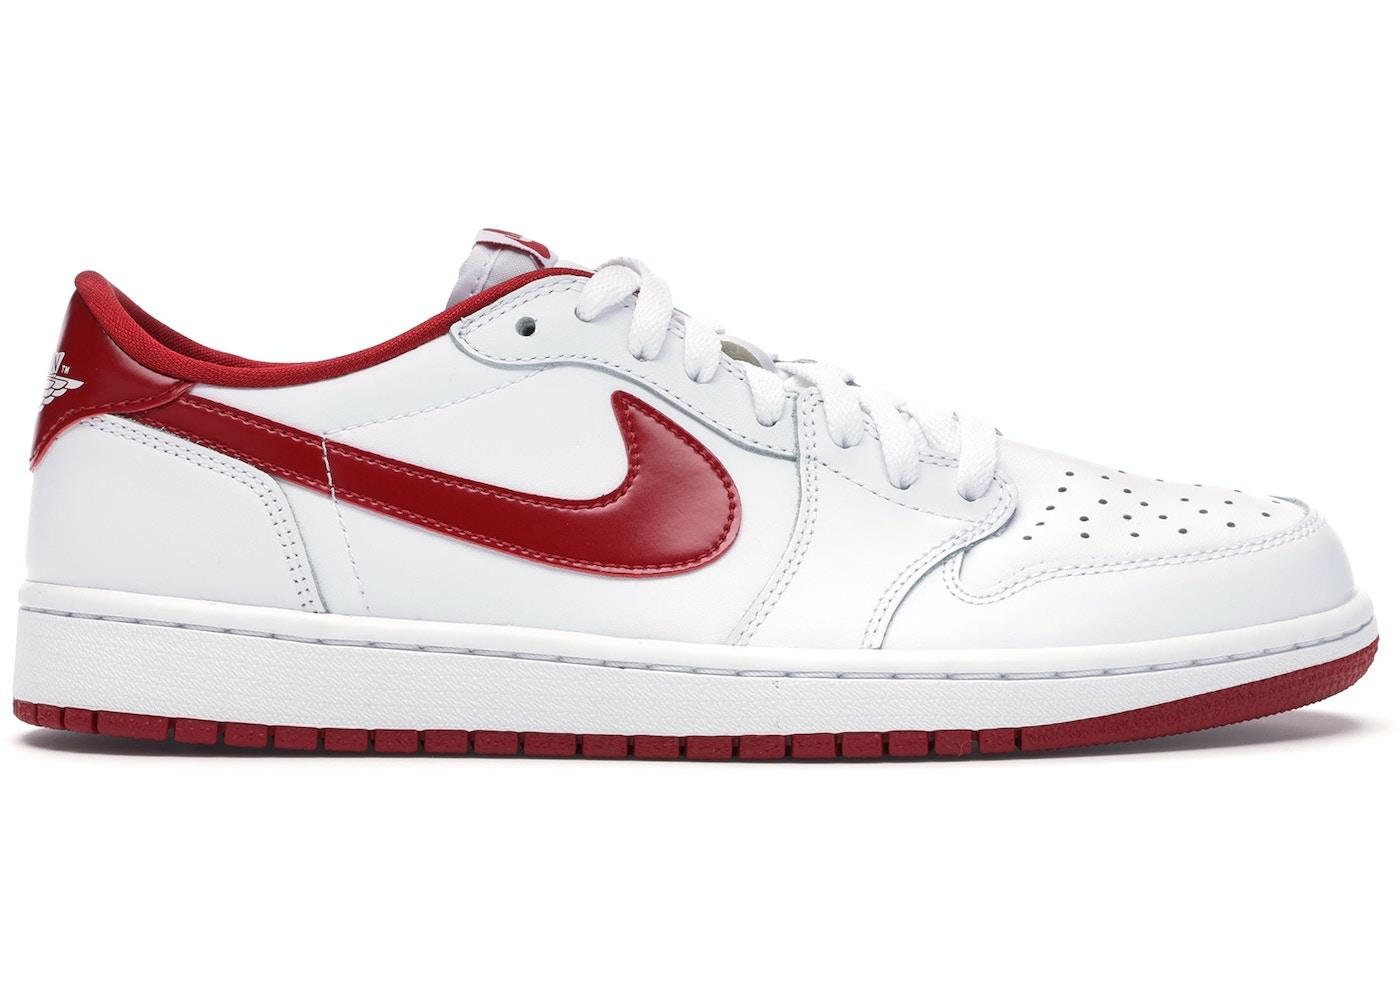 Jordan 1 Retro Low White Varsity Red 705329 101